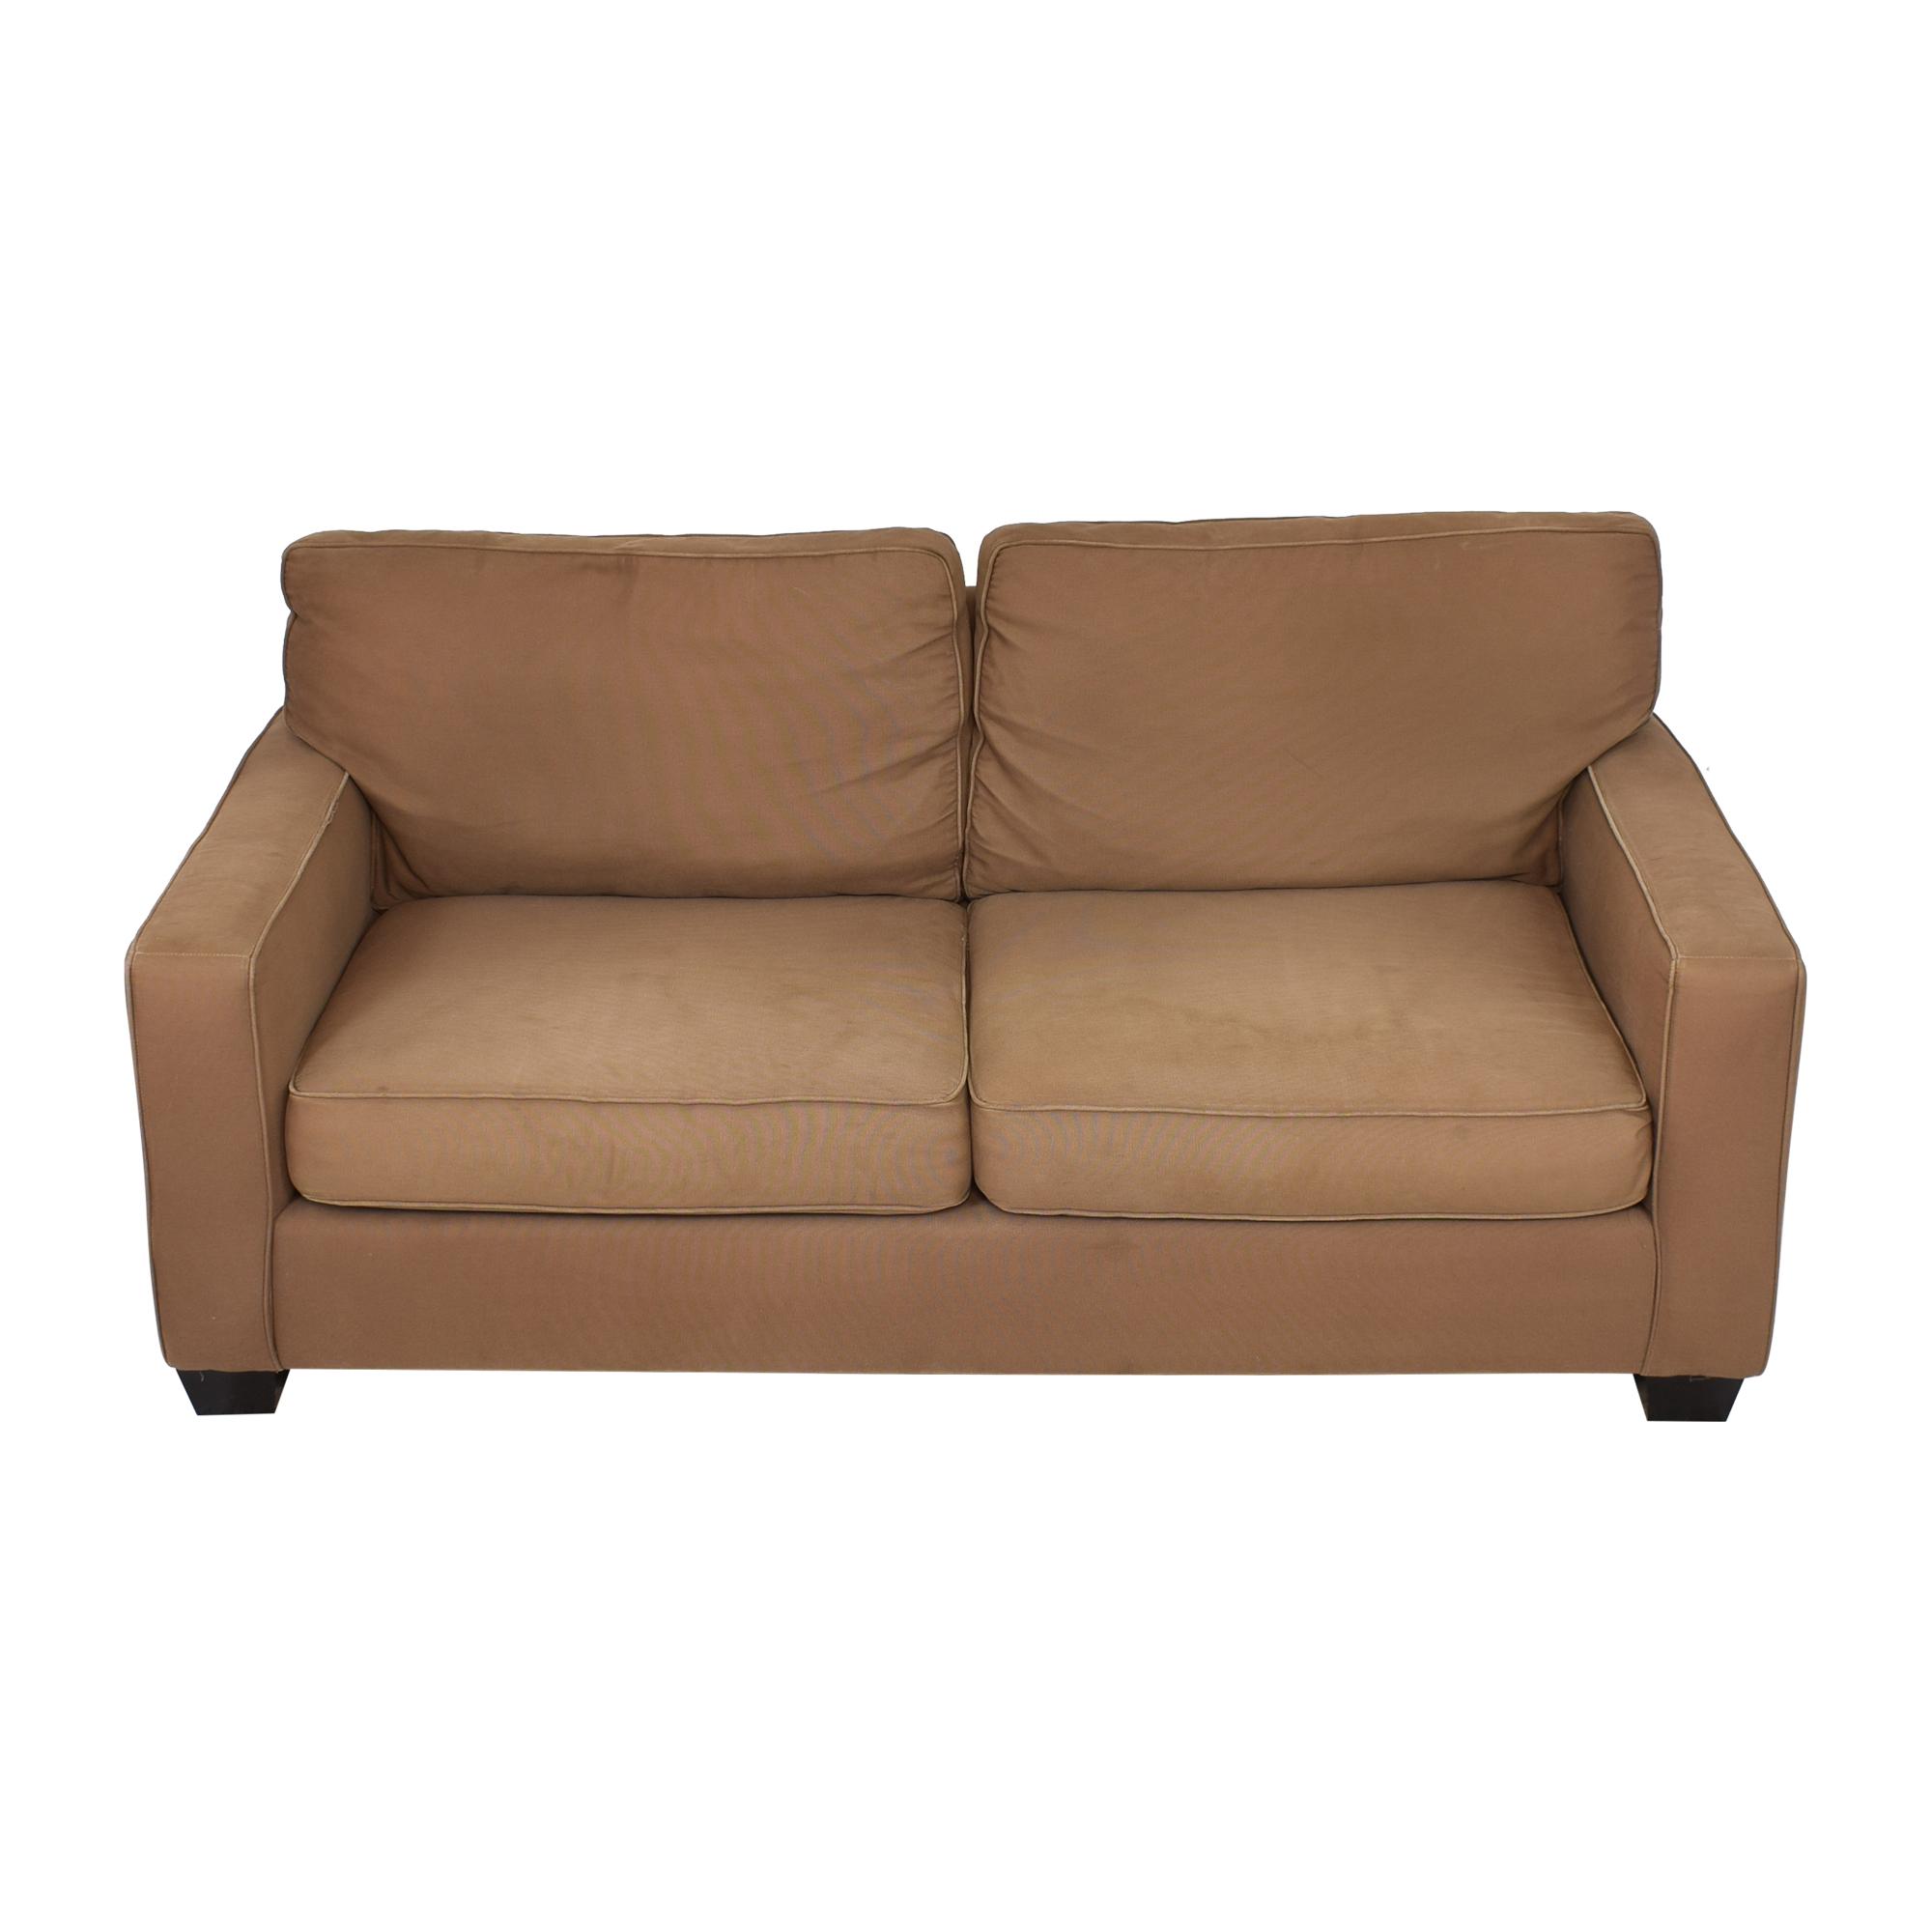 buy Pottery Barn PB Comfort Square Arm Upholstered Sofa Pottery Barn